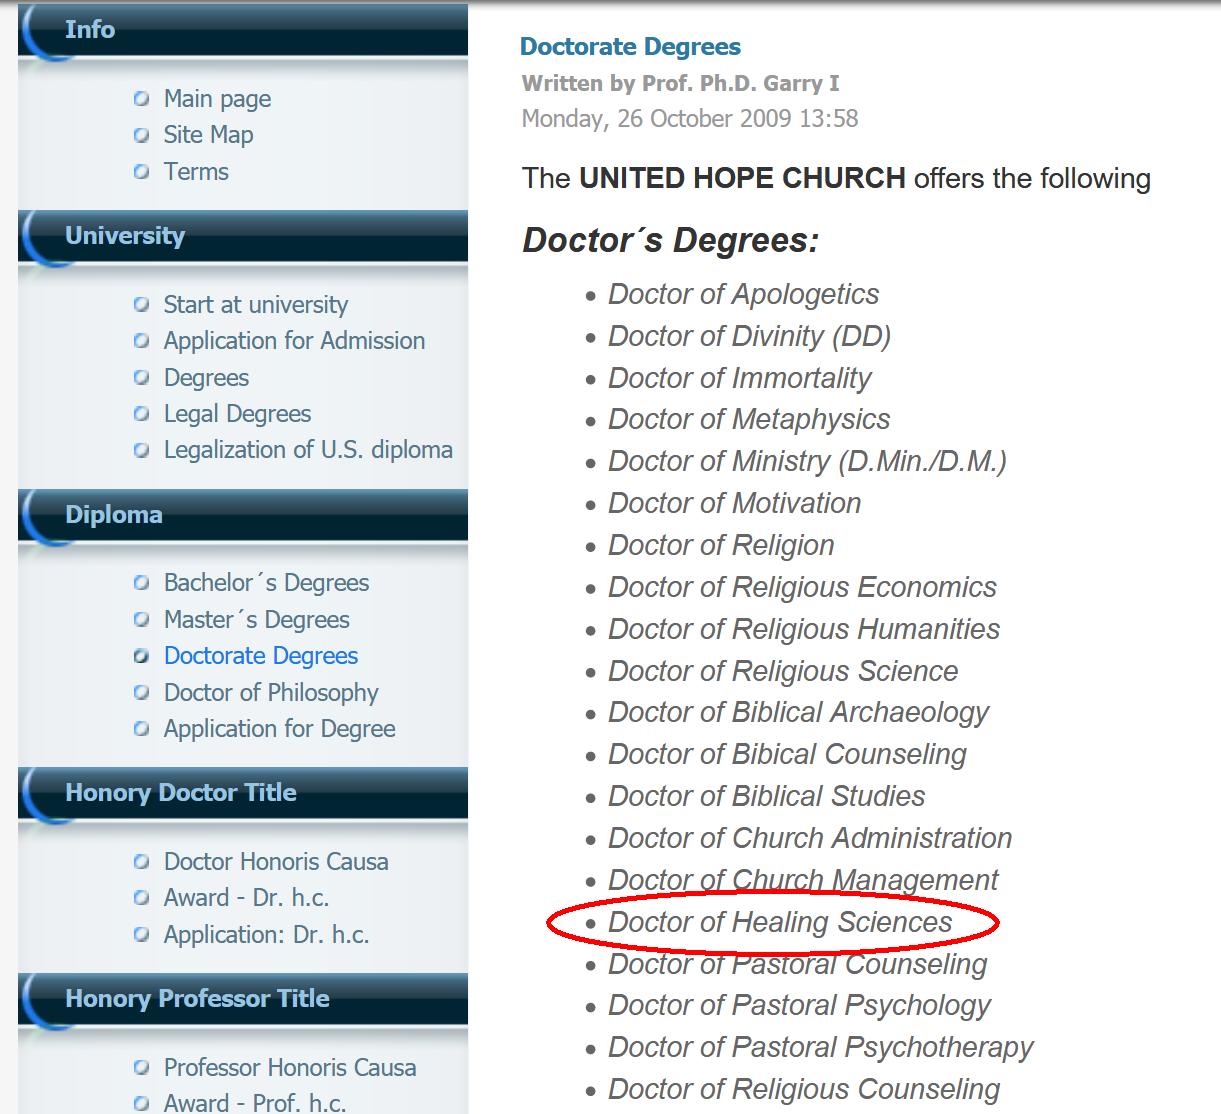 "7. kép: A ""United Hope Church University""-től <a href='https://web.archive.org/web/20100408114240/http://unitedhopechurch.com/index.php?option=com_rokquickcart&view=rokquickcart&Itemid=81&lang=en#rokquickcart'>megvásárolható doktori diplomák</a>"